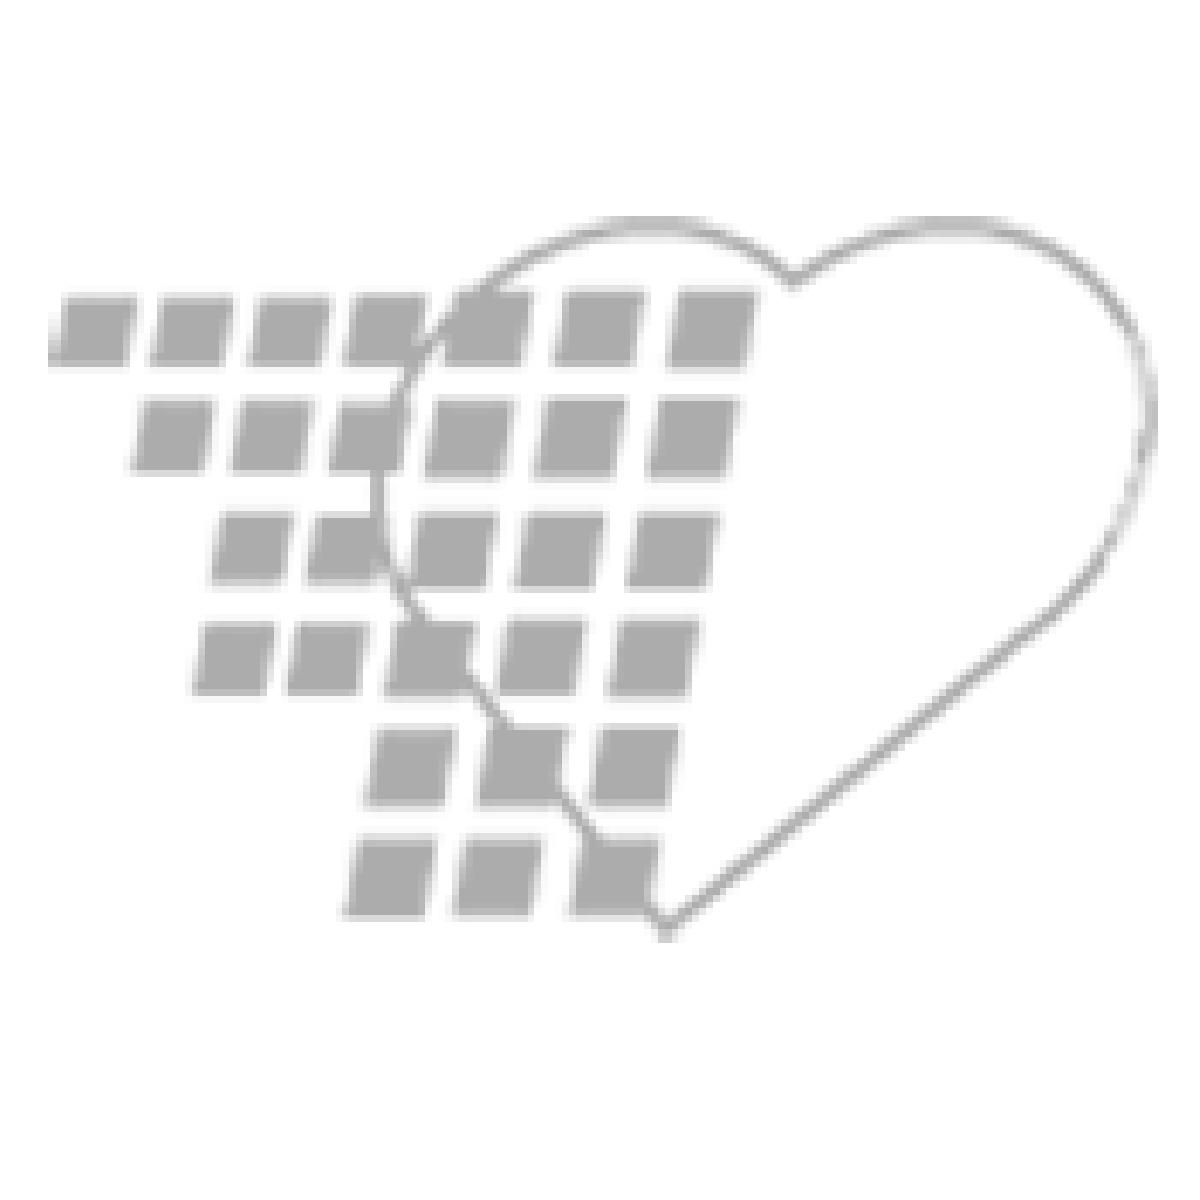 06-93-3114 Demo Dose® Tuberculn, PPD 1 mL (5 TU/0.1 5 mL)